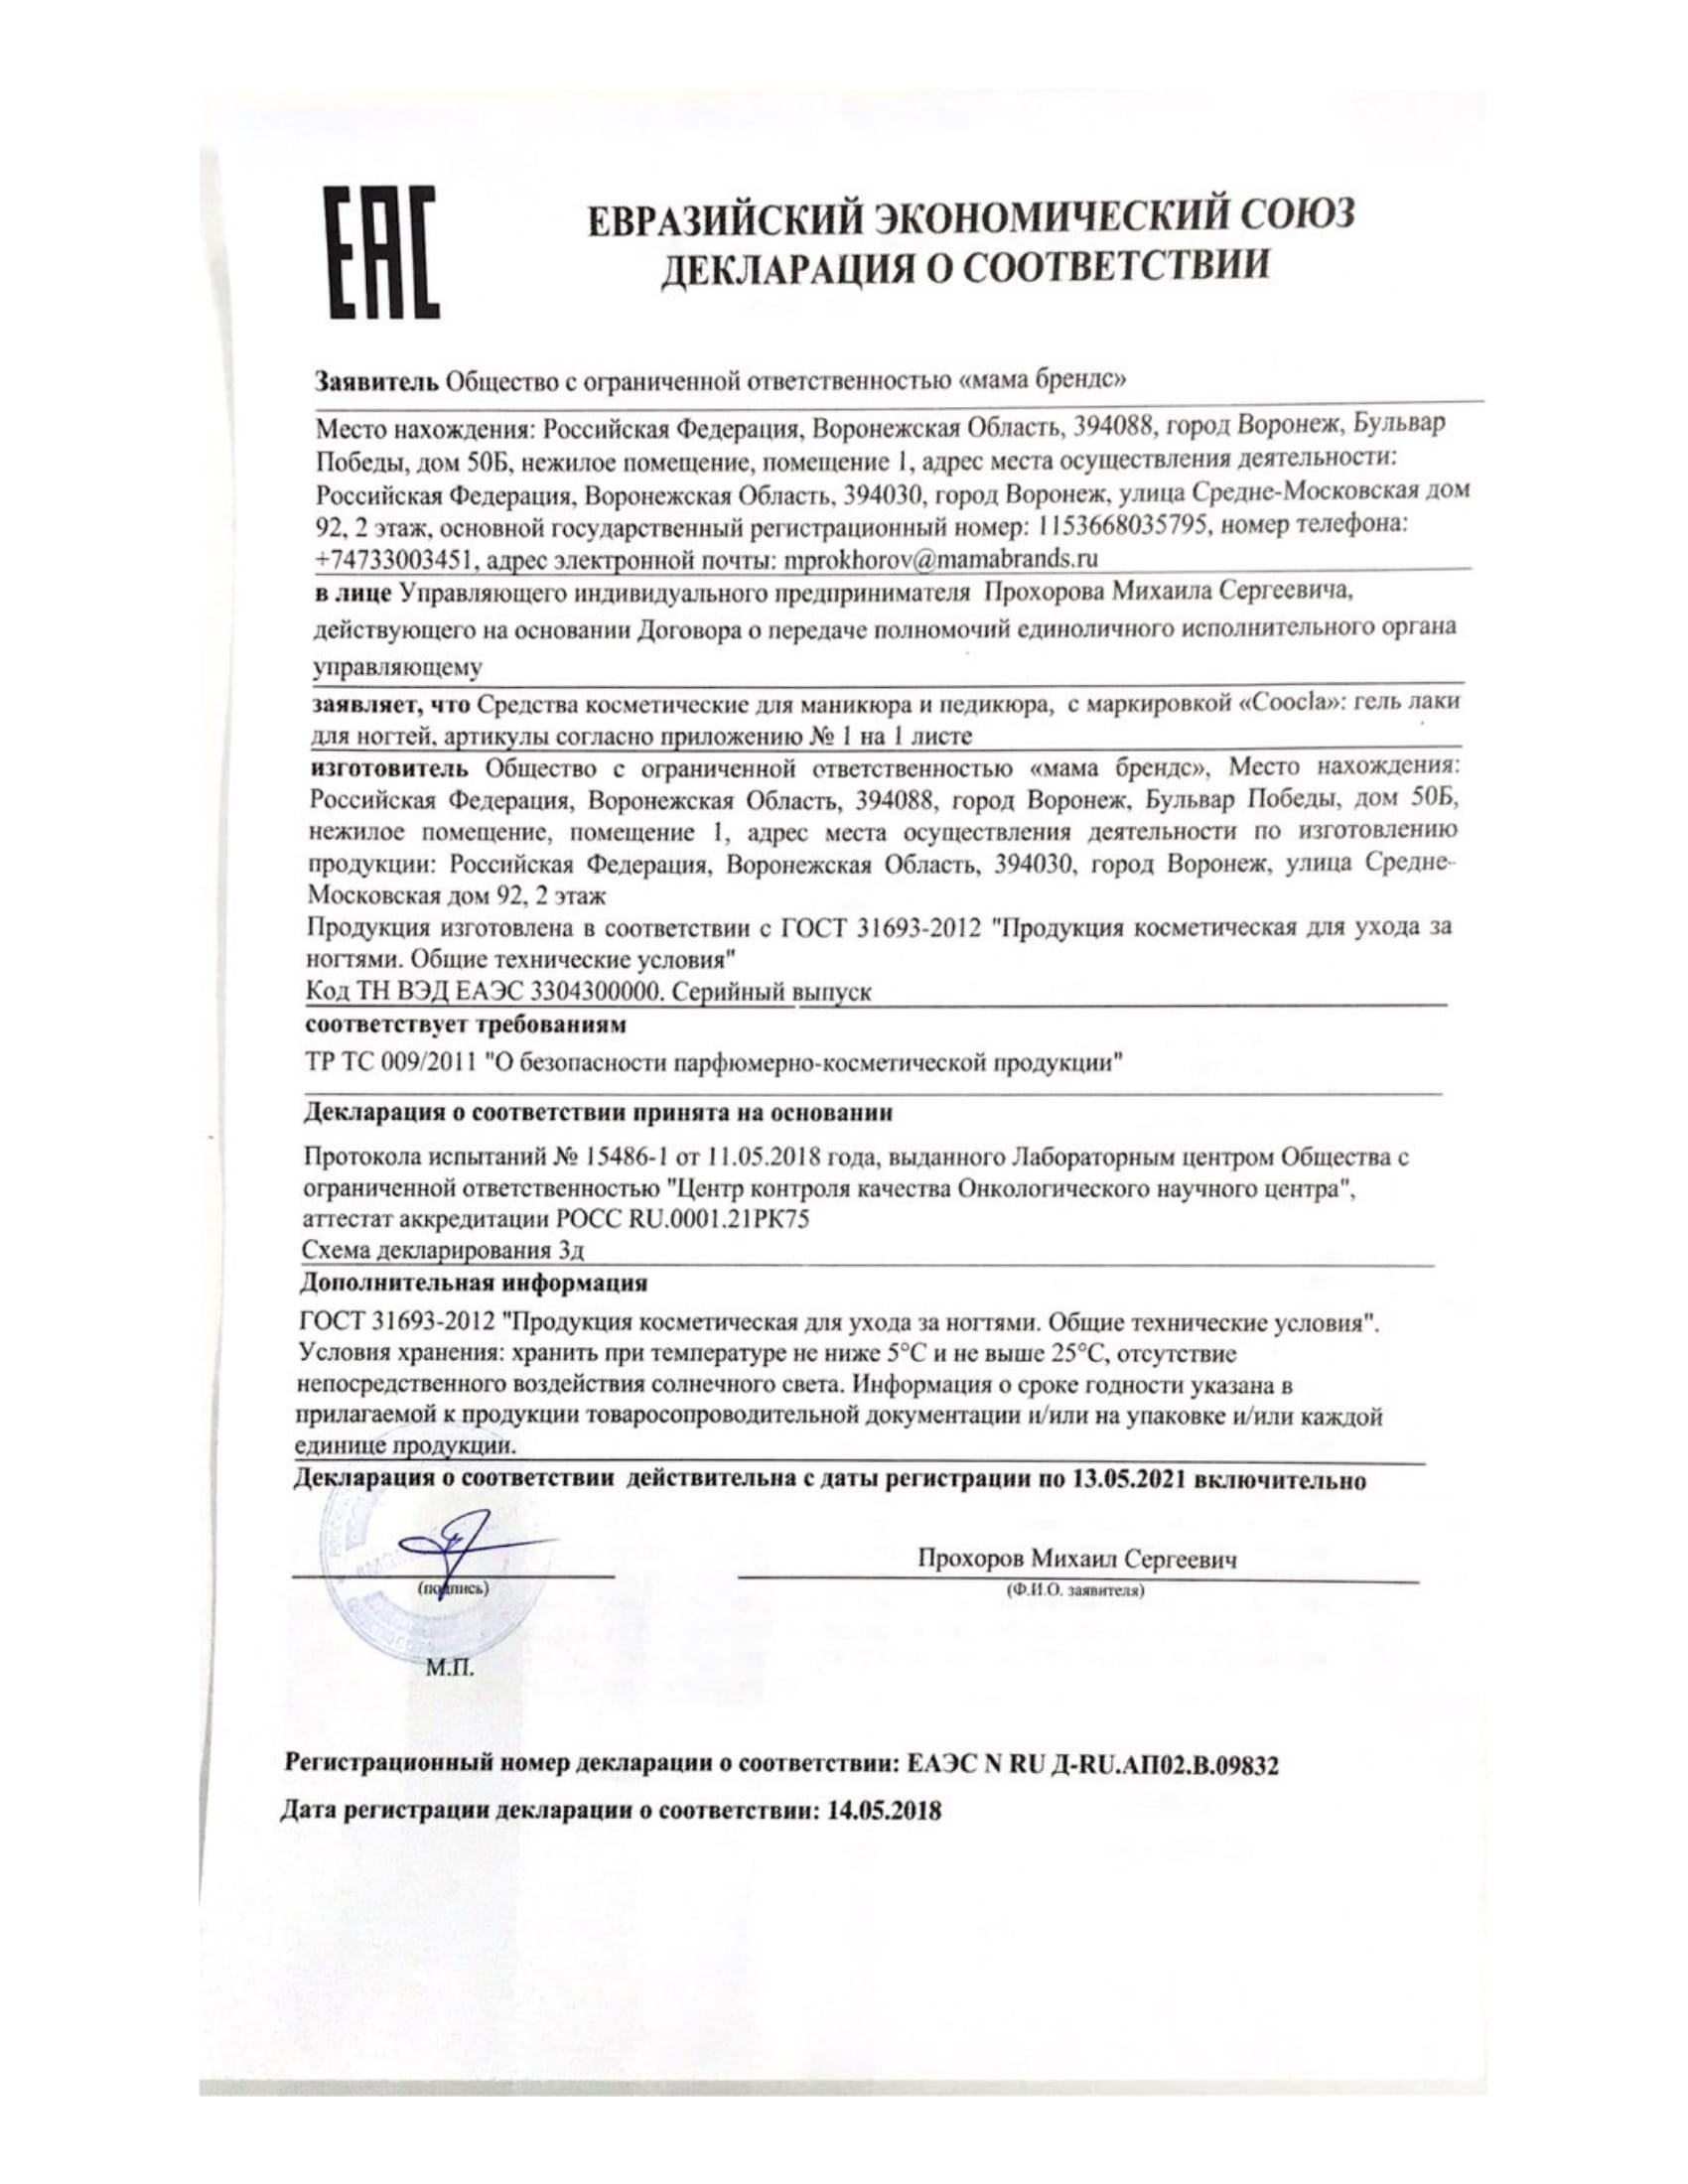 ЕАЭС N RU Д-RU.АП02.В.09832-1